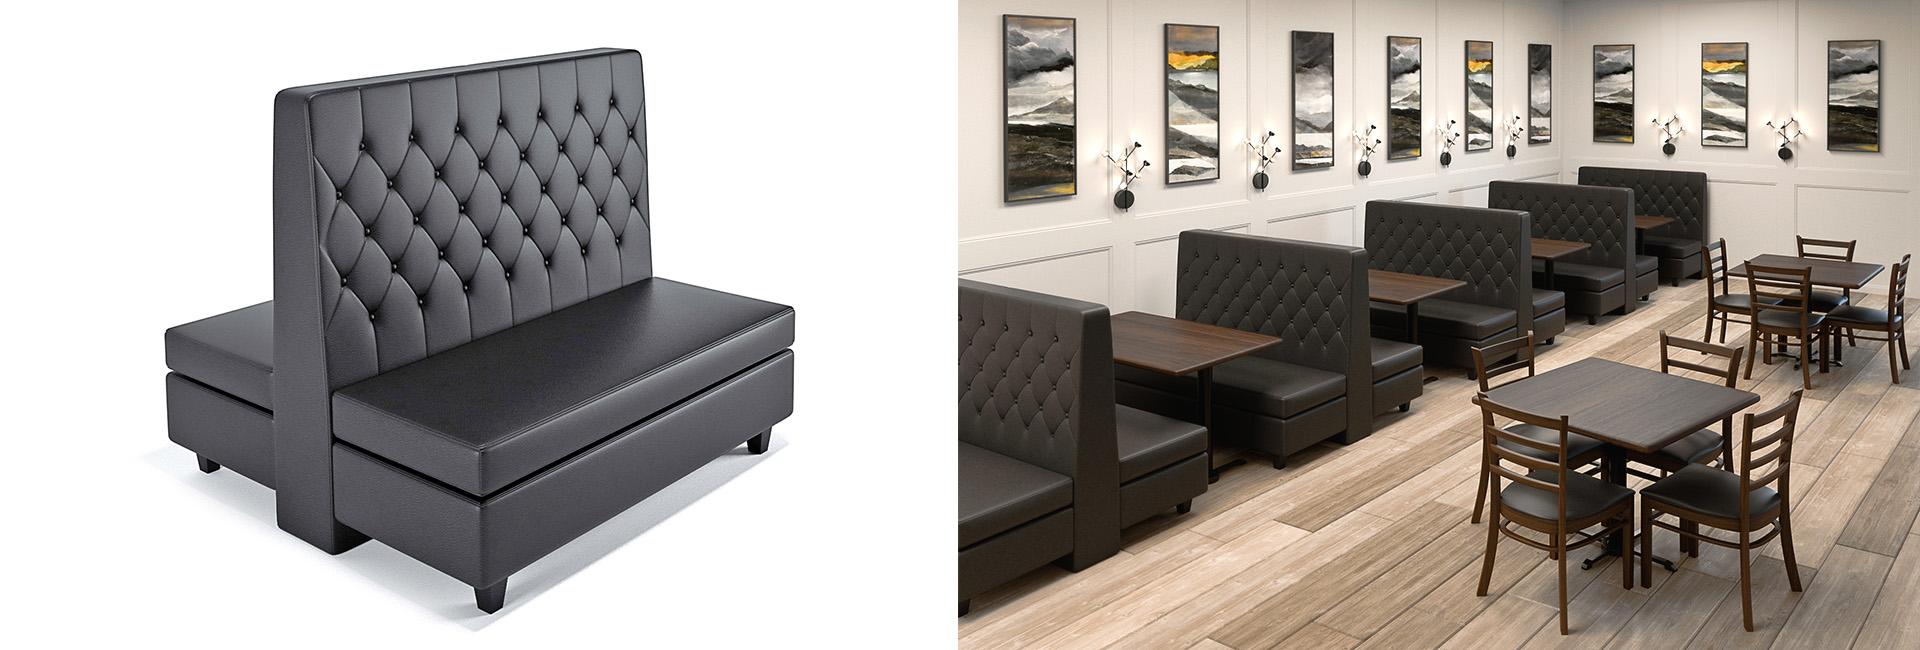 Restaurant Interior Solutions